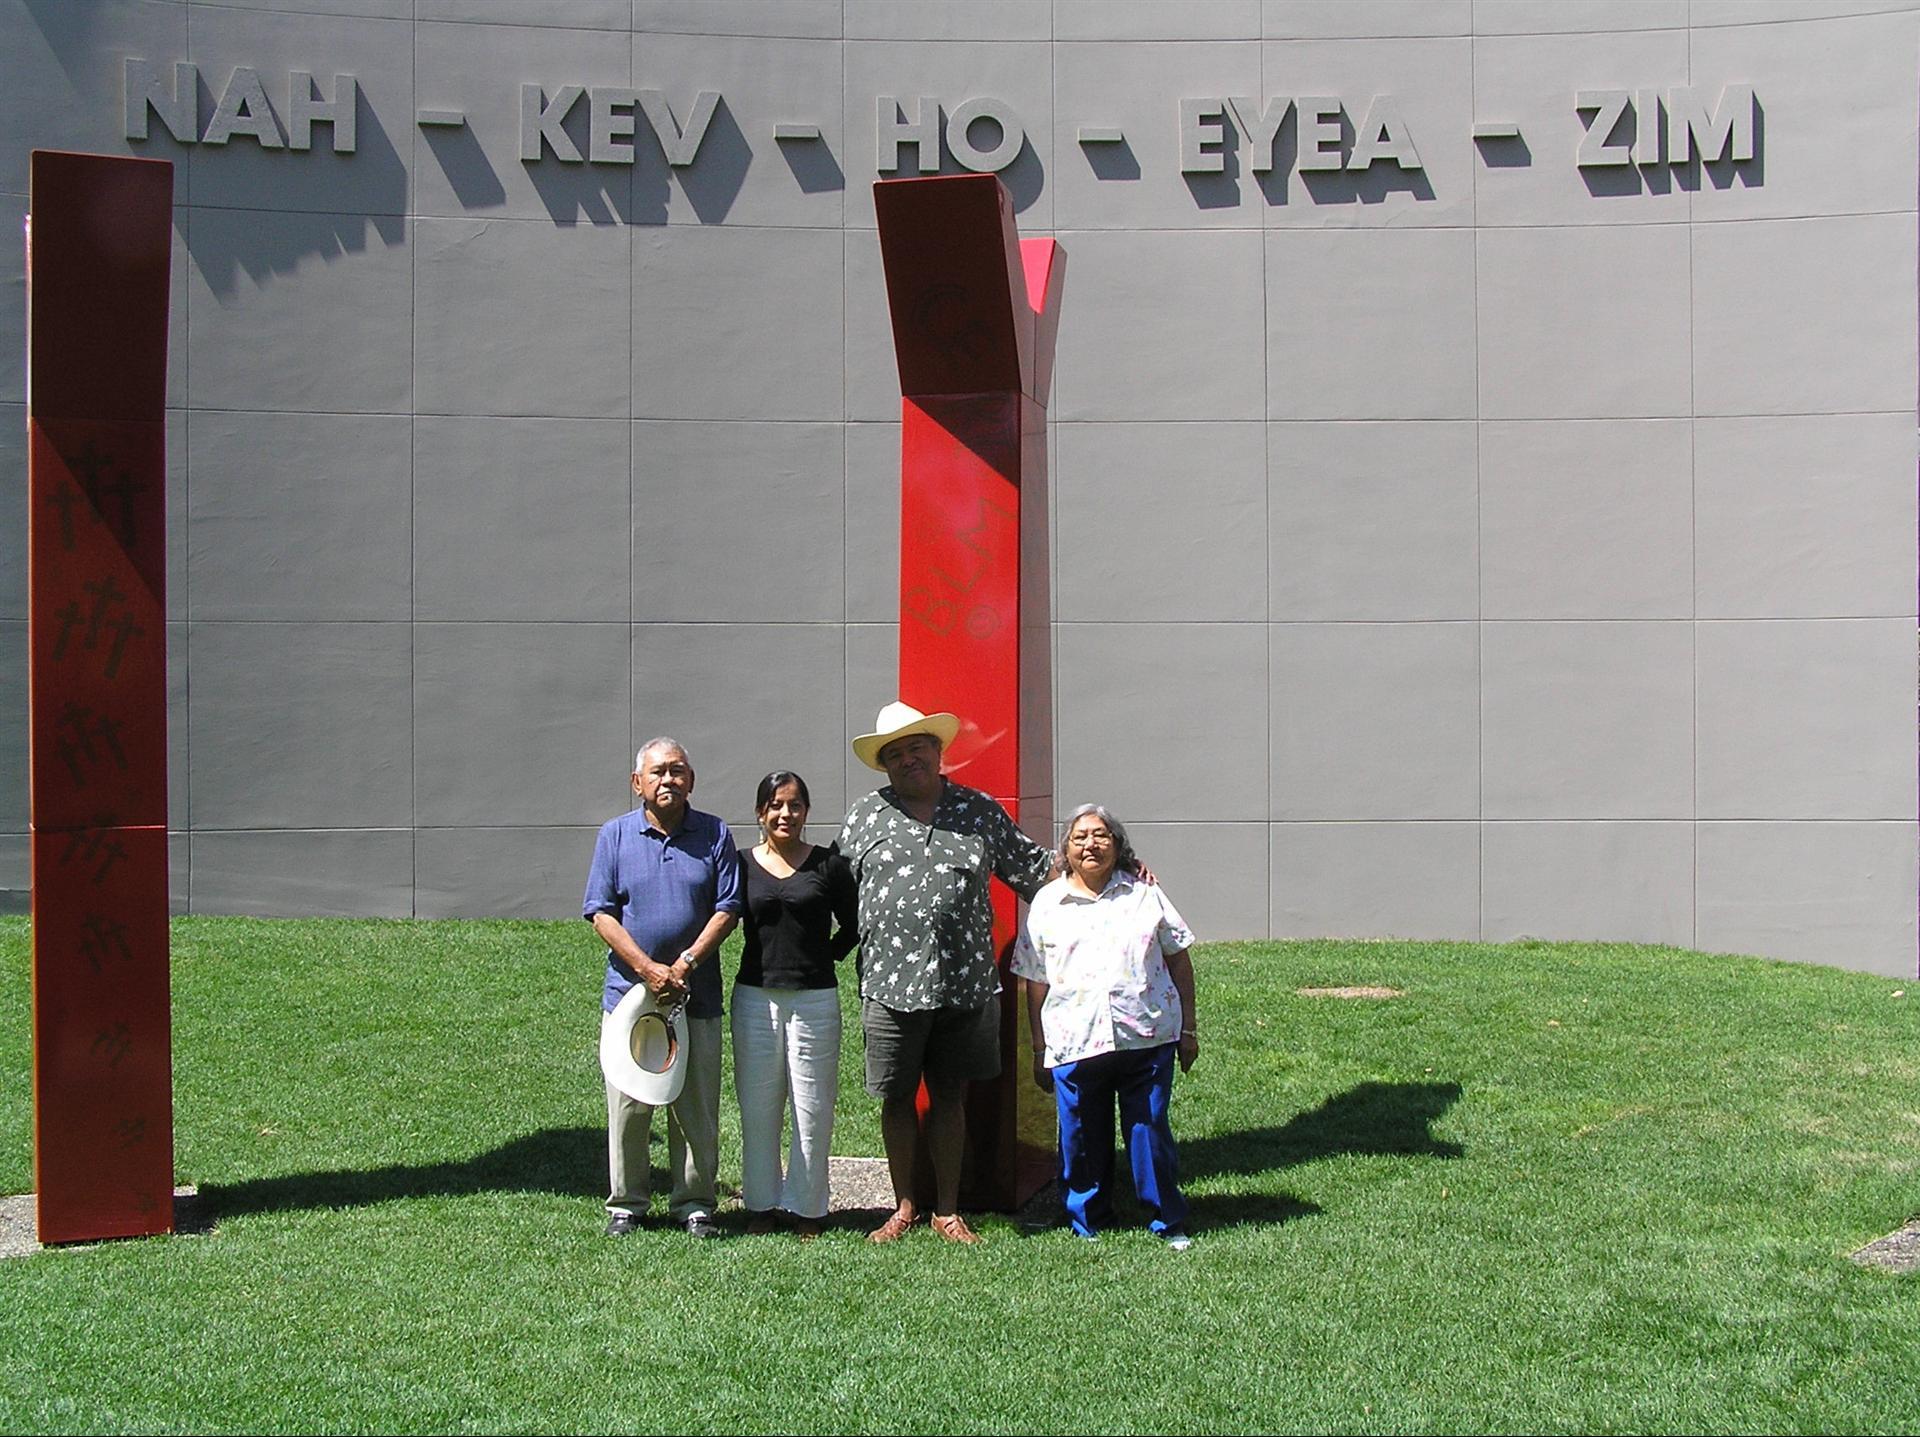 """nah-kev-ho-eyea-zim"" on North Wall, celebration ceremony 2005 (old site)"